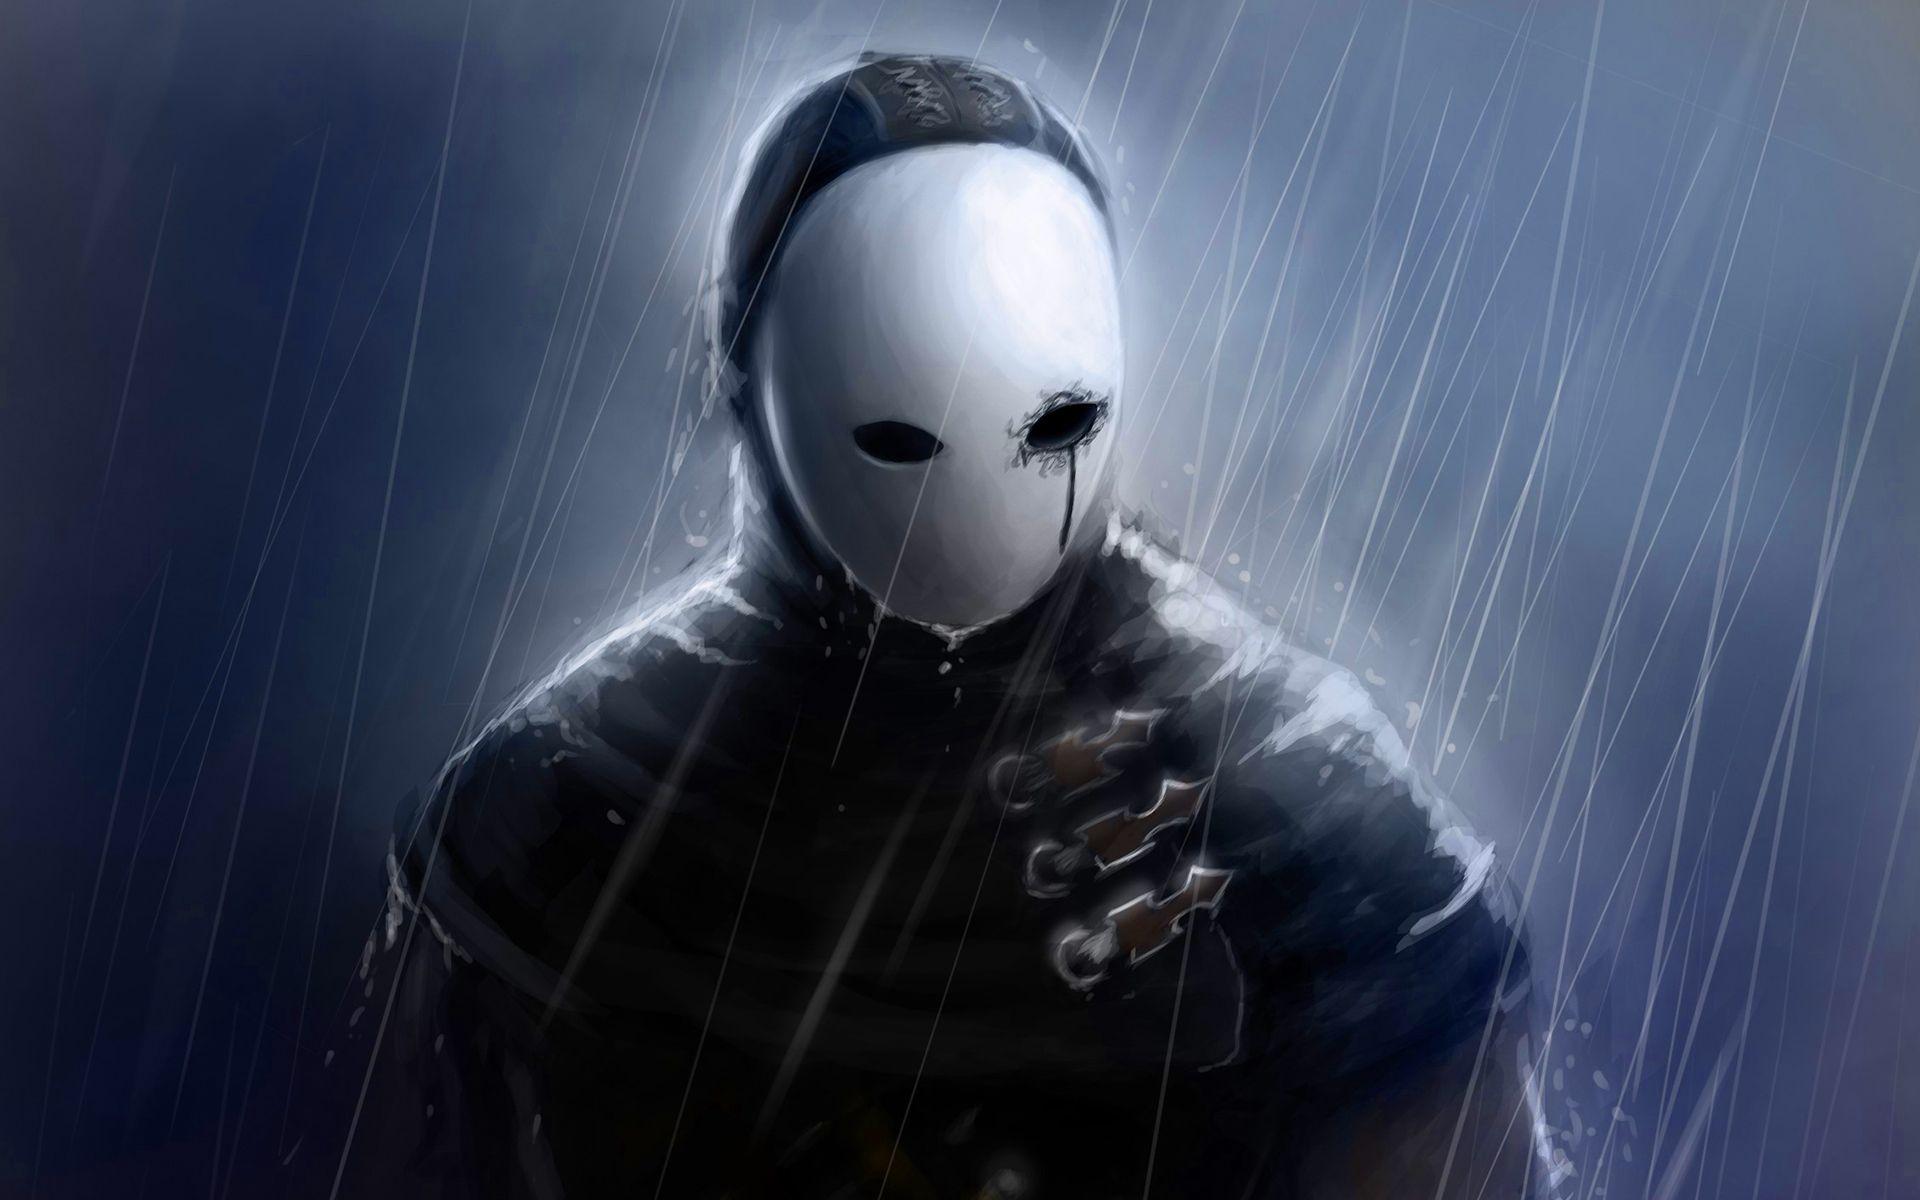 Dark Souls 2 2014 All Cutscenes Walkthrough Gameplay: Mask Dark Souls 2 Wallpaper Wallpaper